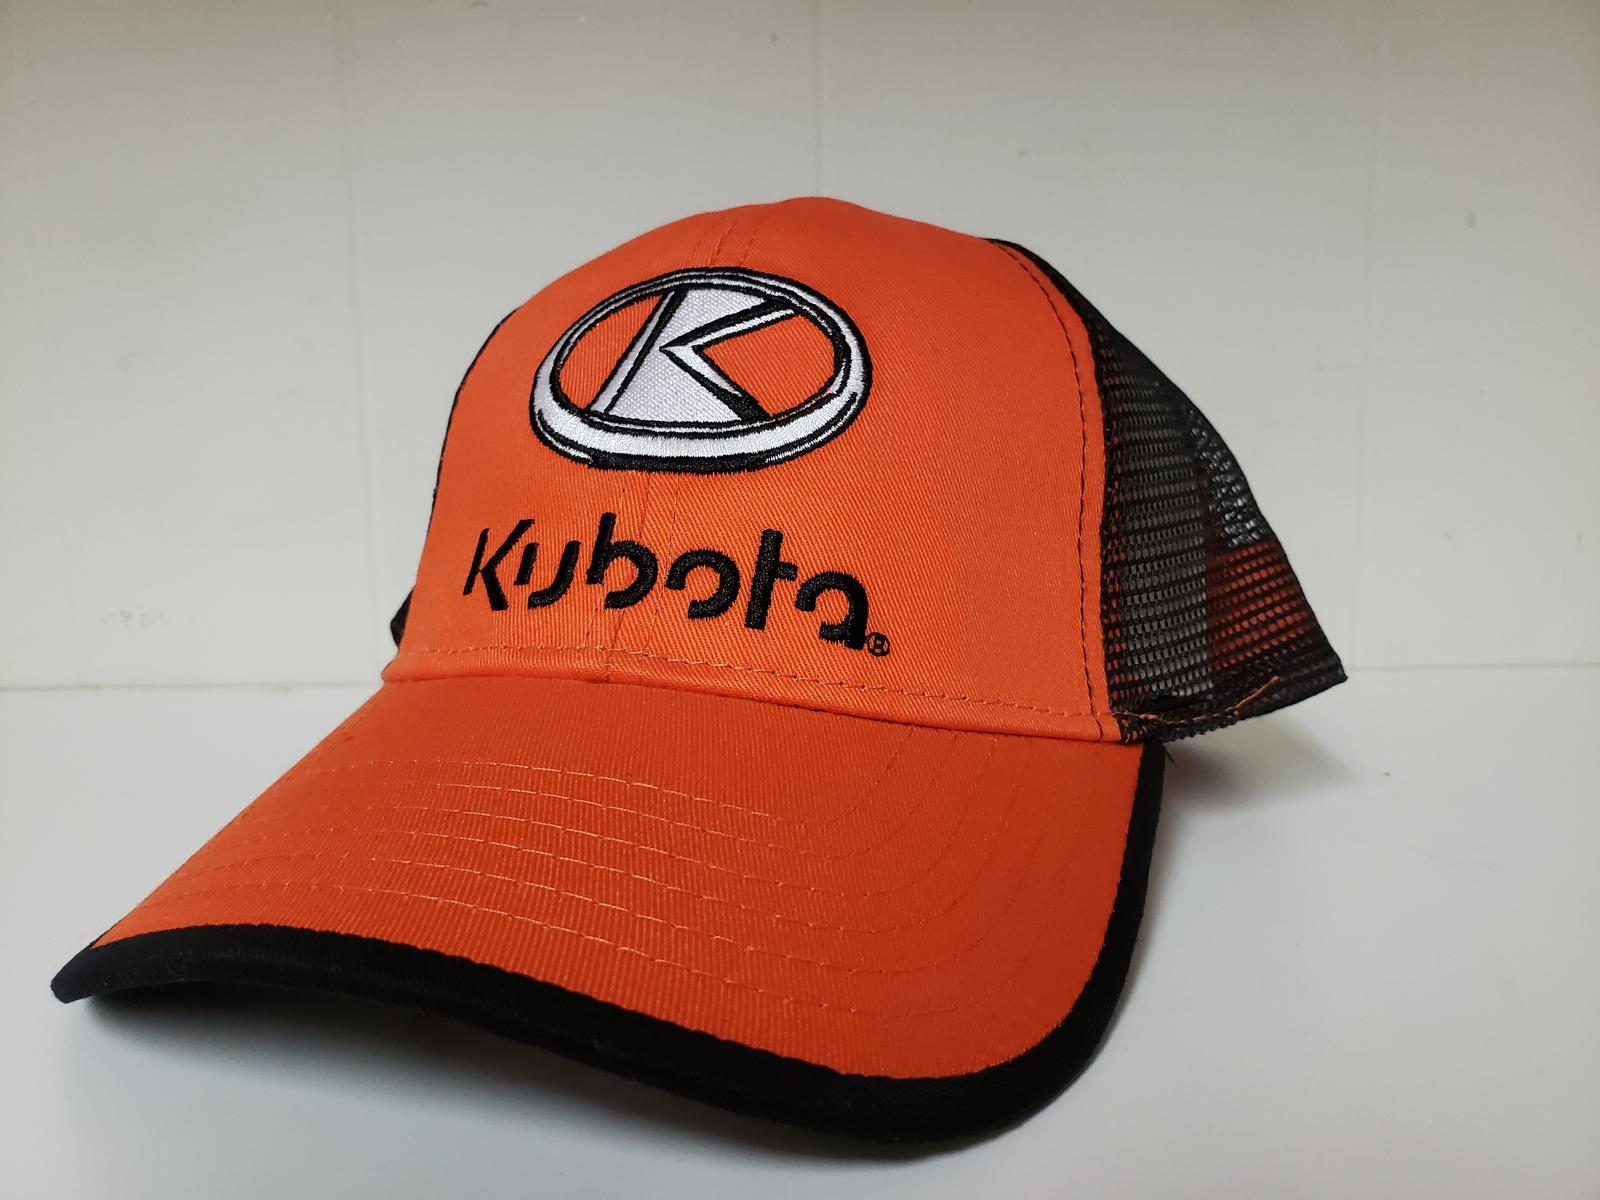 2c3fbf08c09 Kubota Orange and Black Hat for sale in Quincy